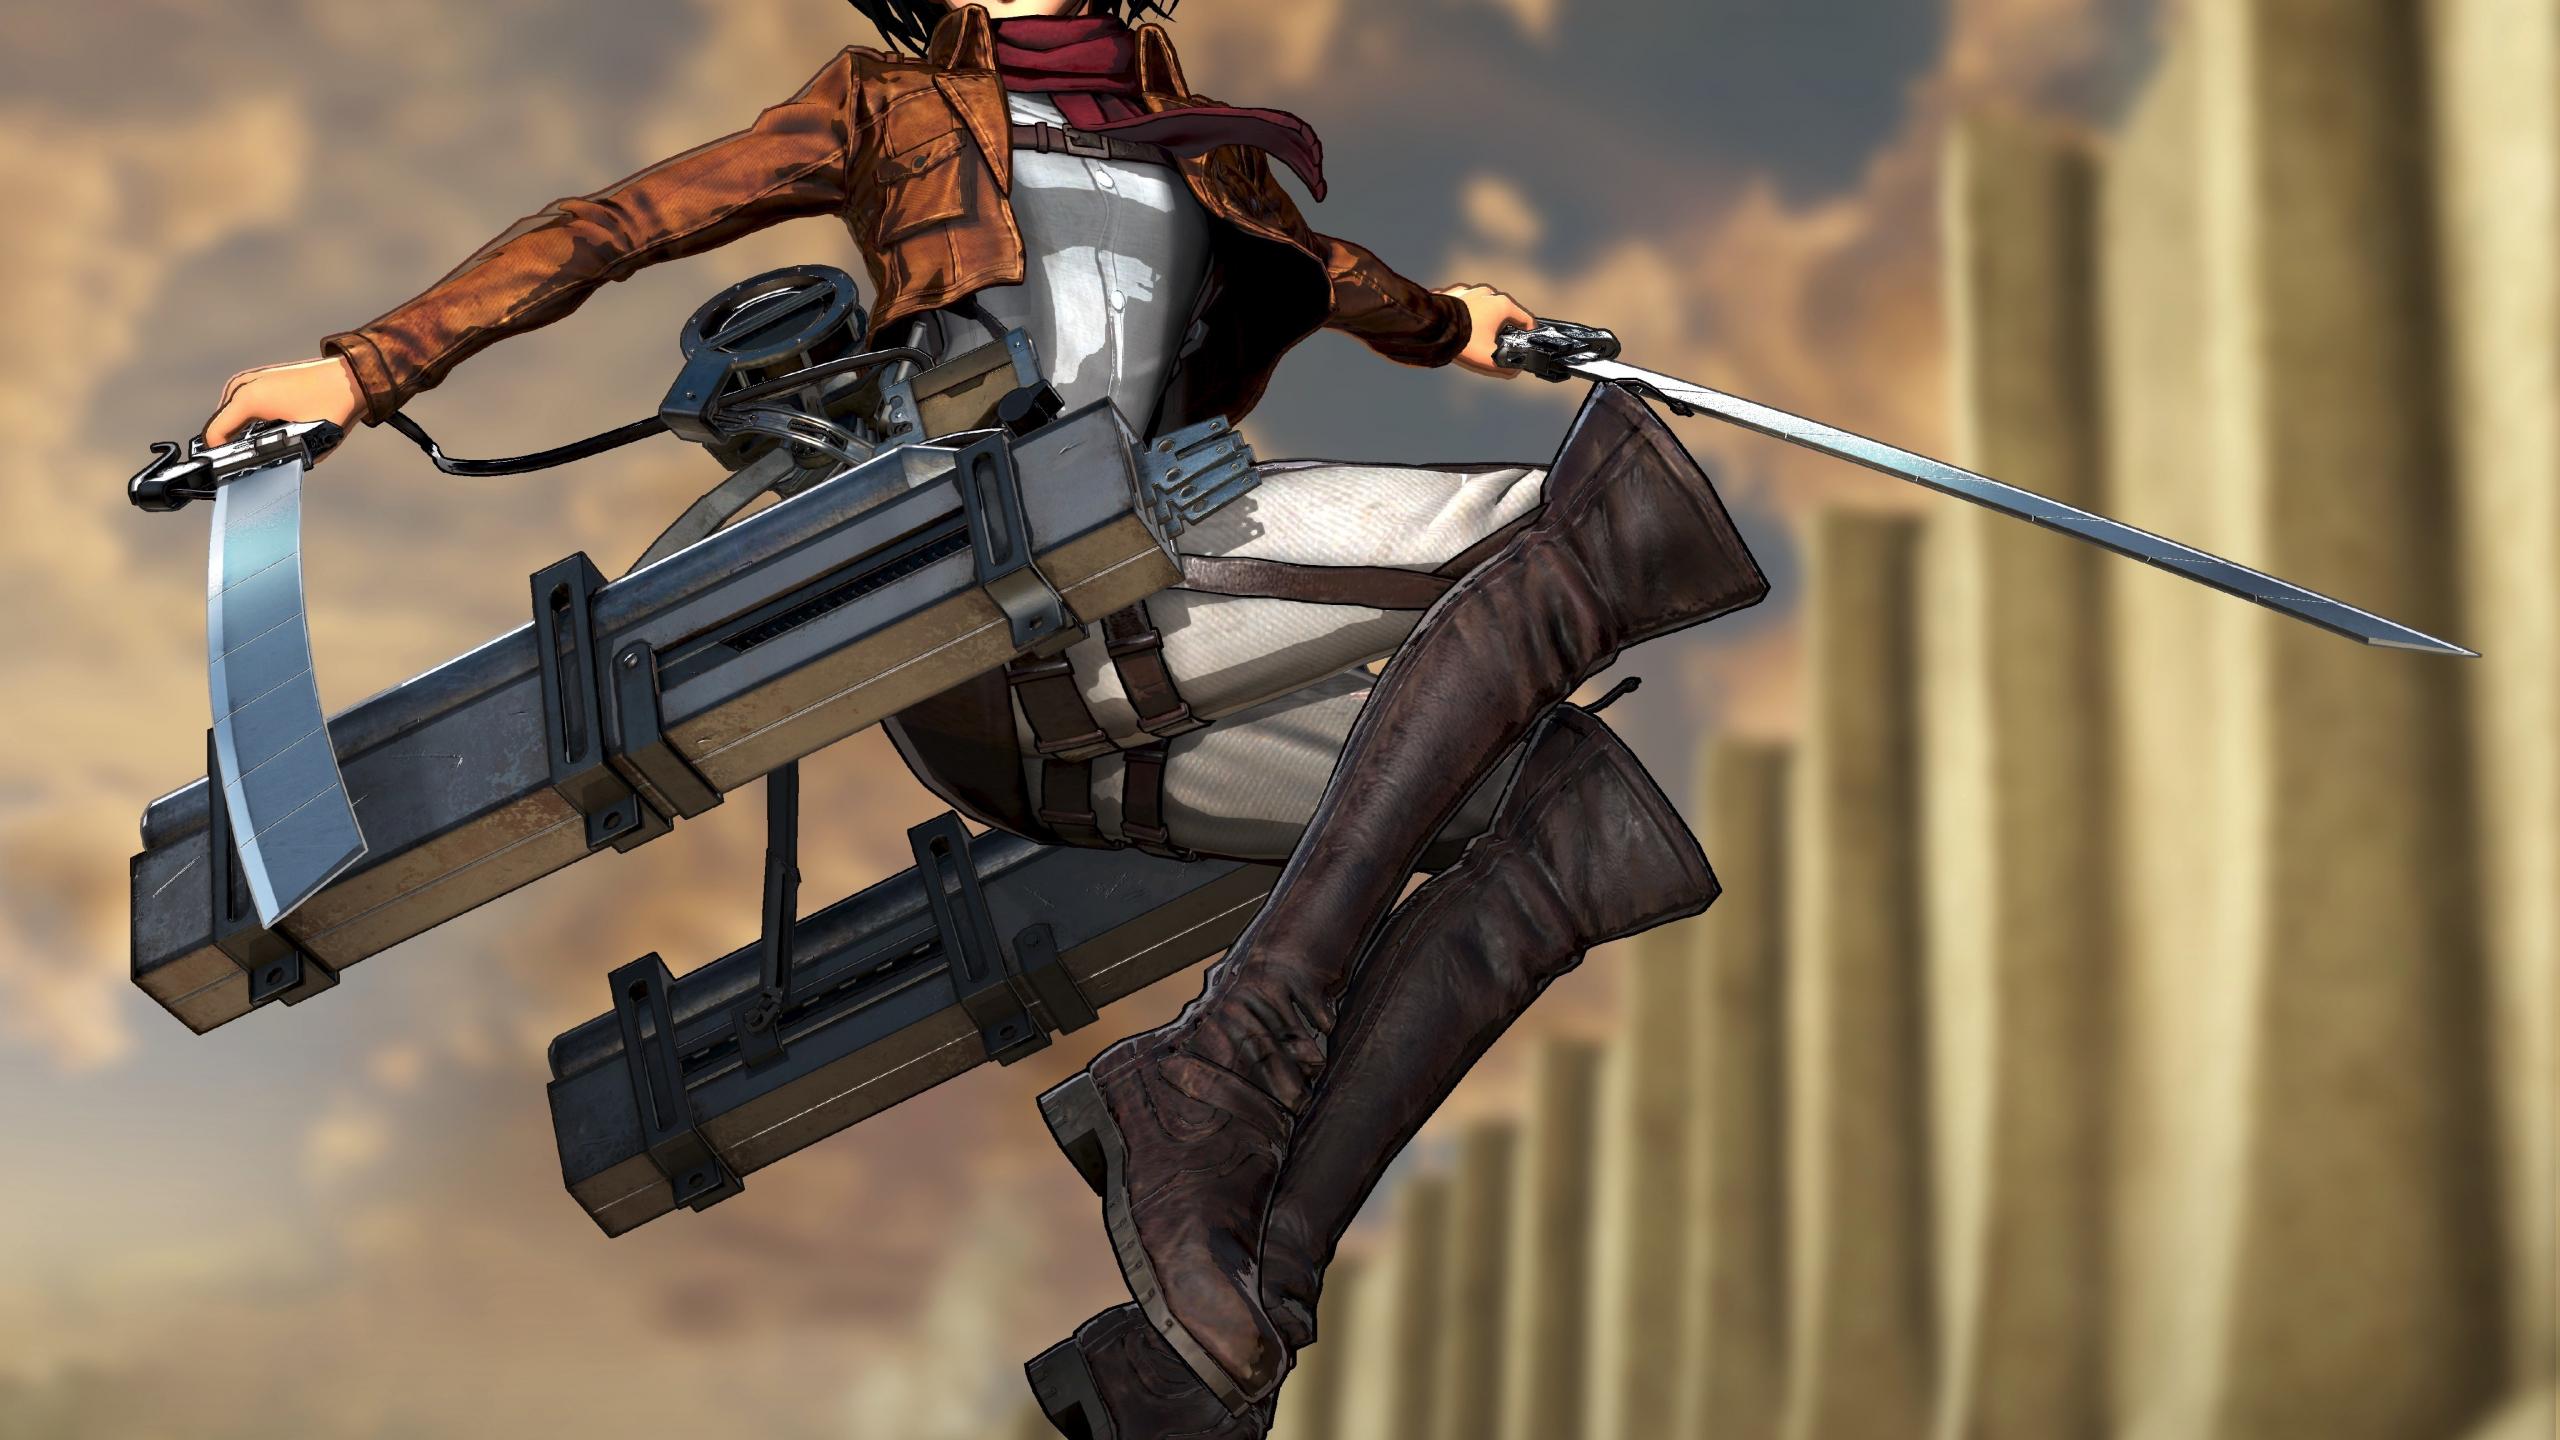 Desktop Wallpaper Jump Anime Girl Mikasa Ackerman Attack On Titan 4k Hd Image Picture Background 6dbc32